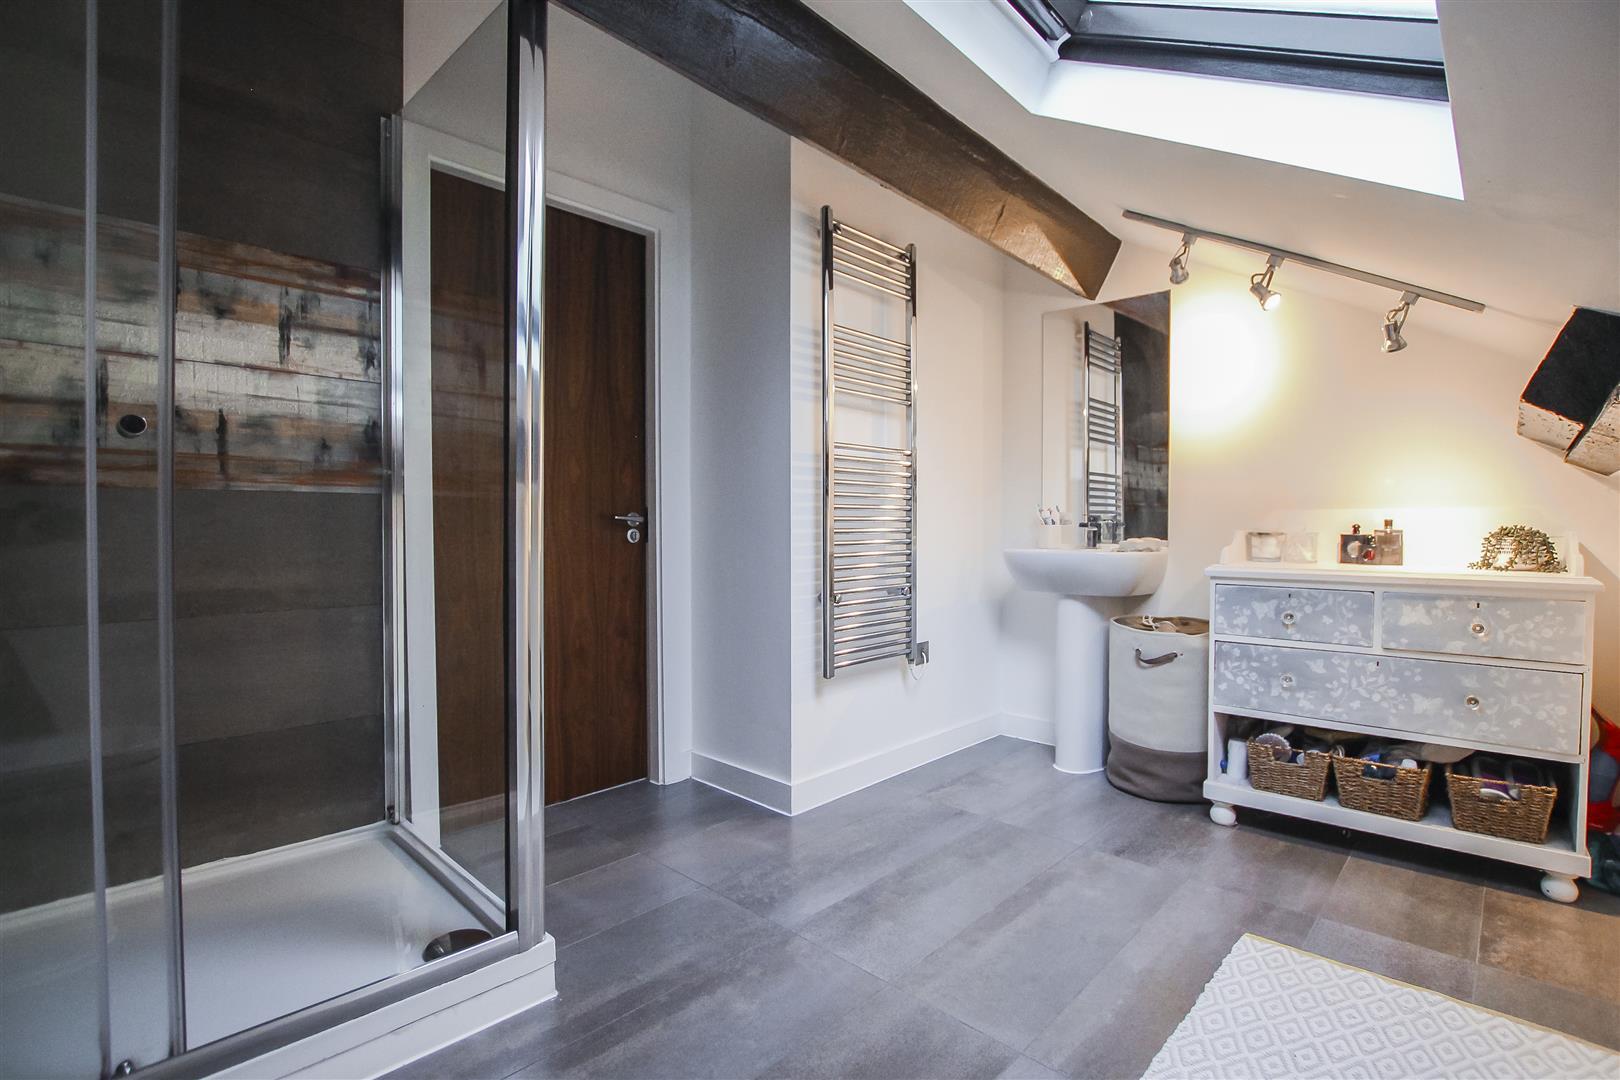 3 Bedroom Duplex Apartment For Sale - Image 10